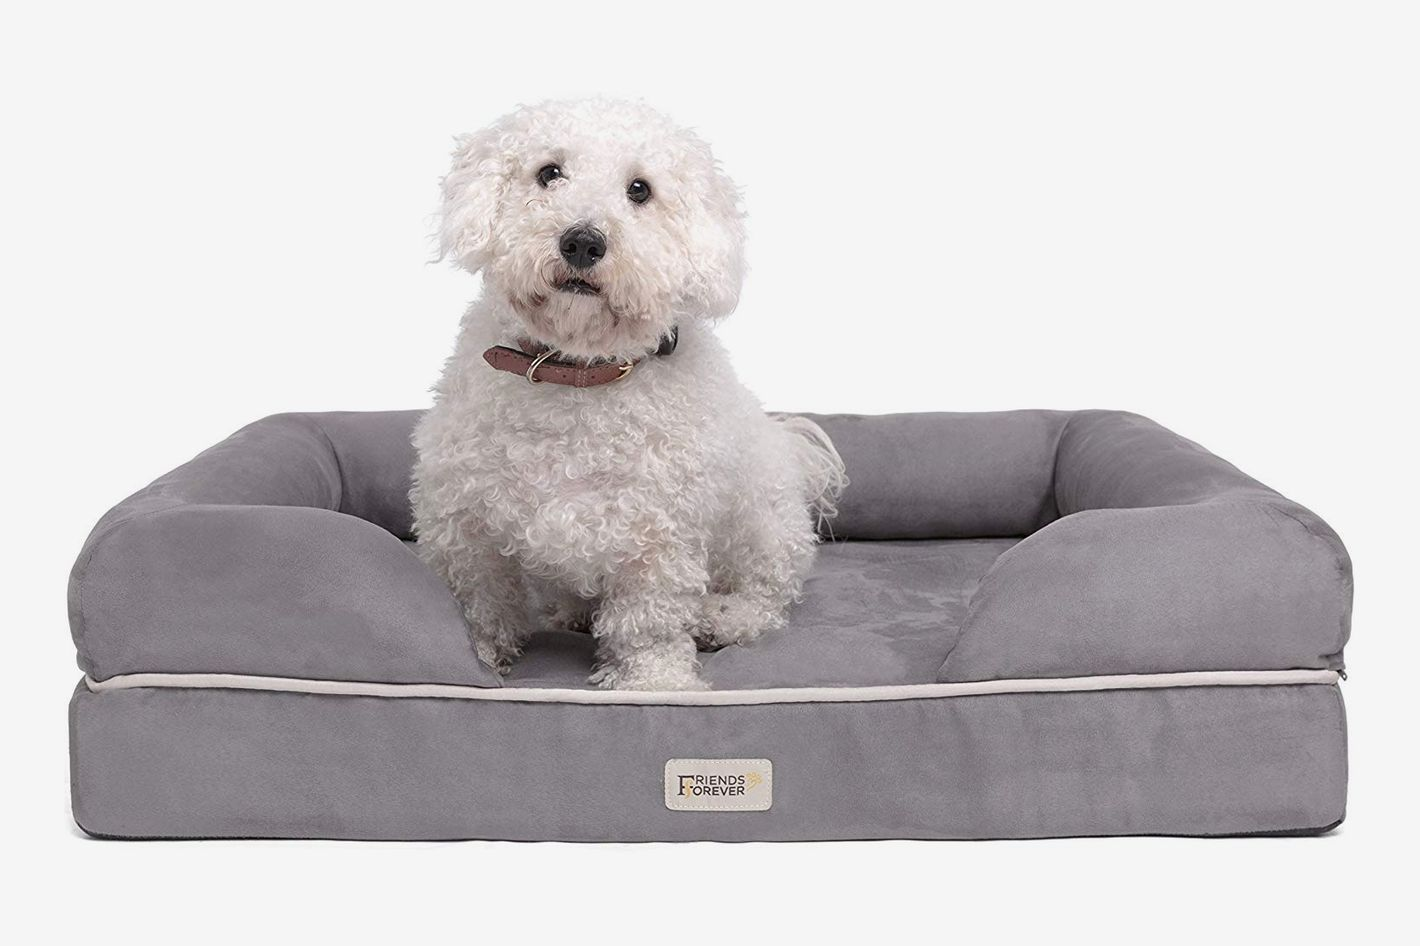 6894396db995 15 Best Dog Beds 2019: Foam, Suede, Shag, Cooling